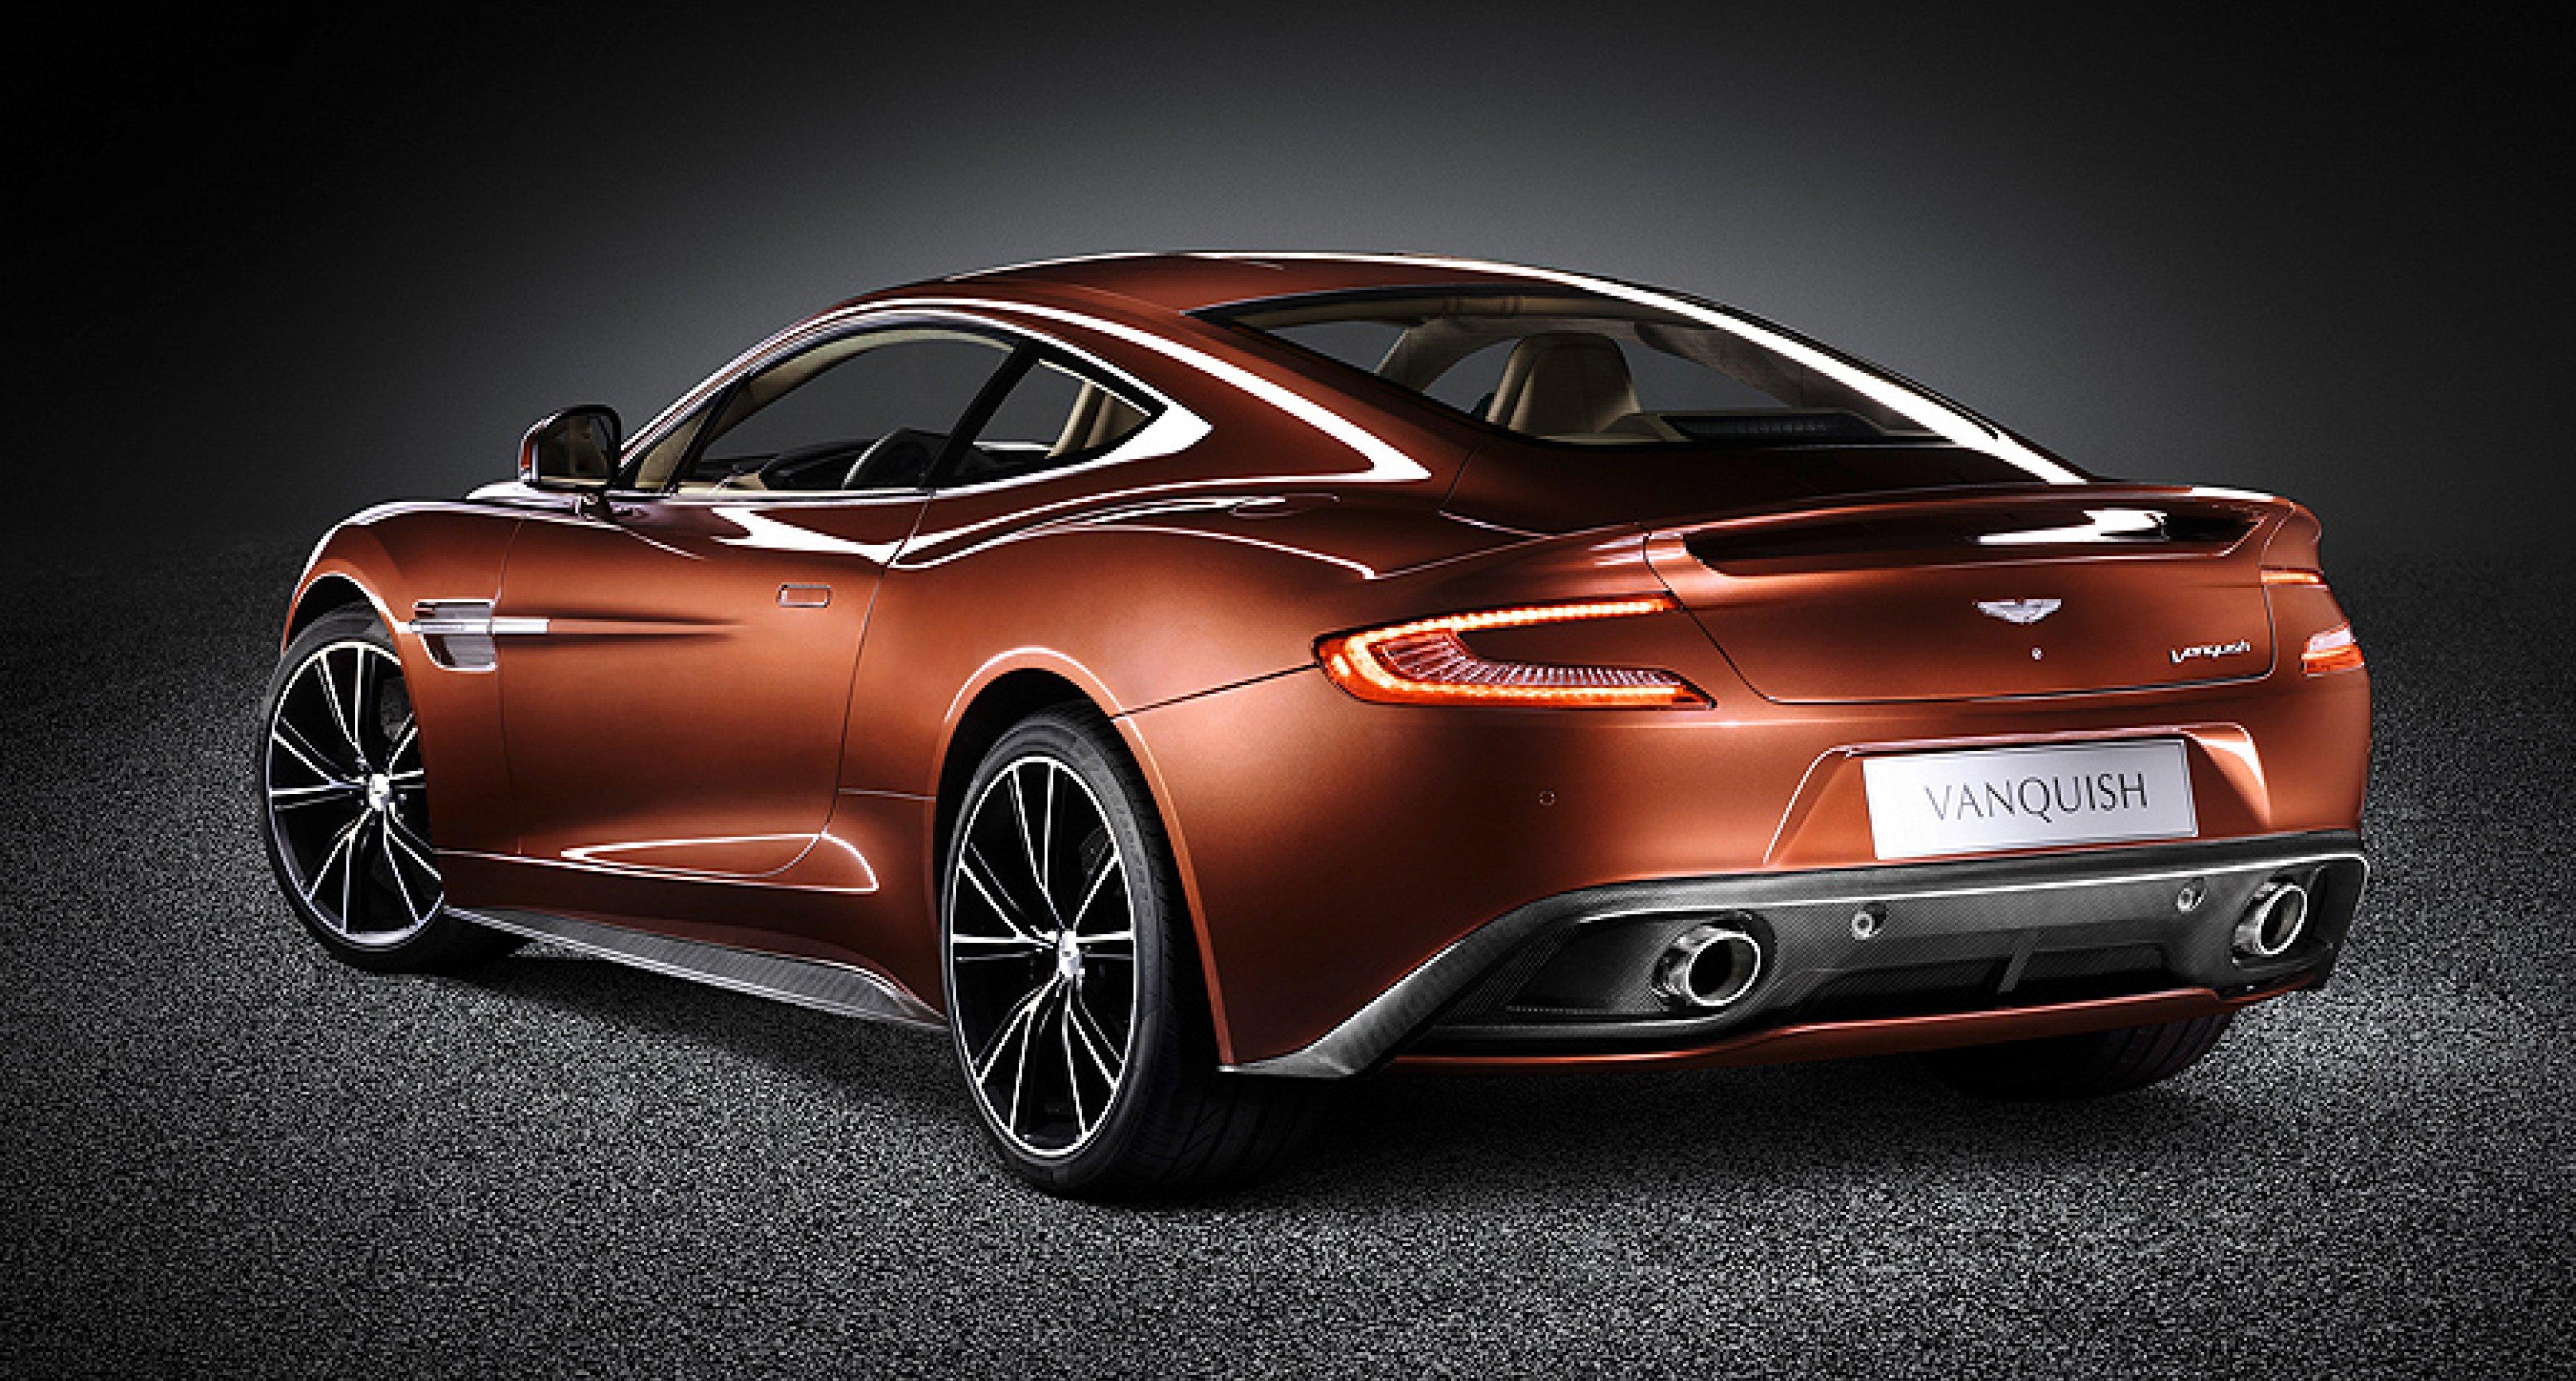 The 2012 Aston Martin Vanquish Classic Driver Magazine